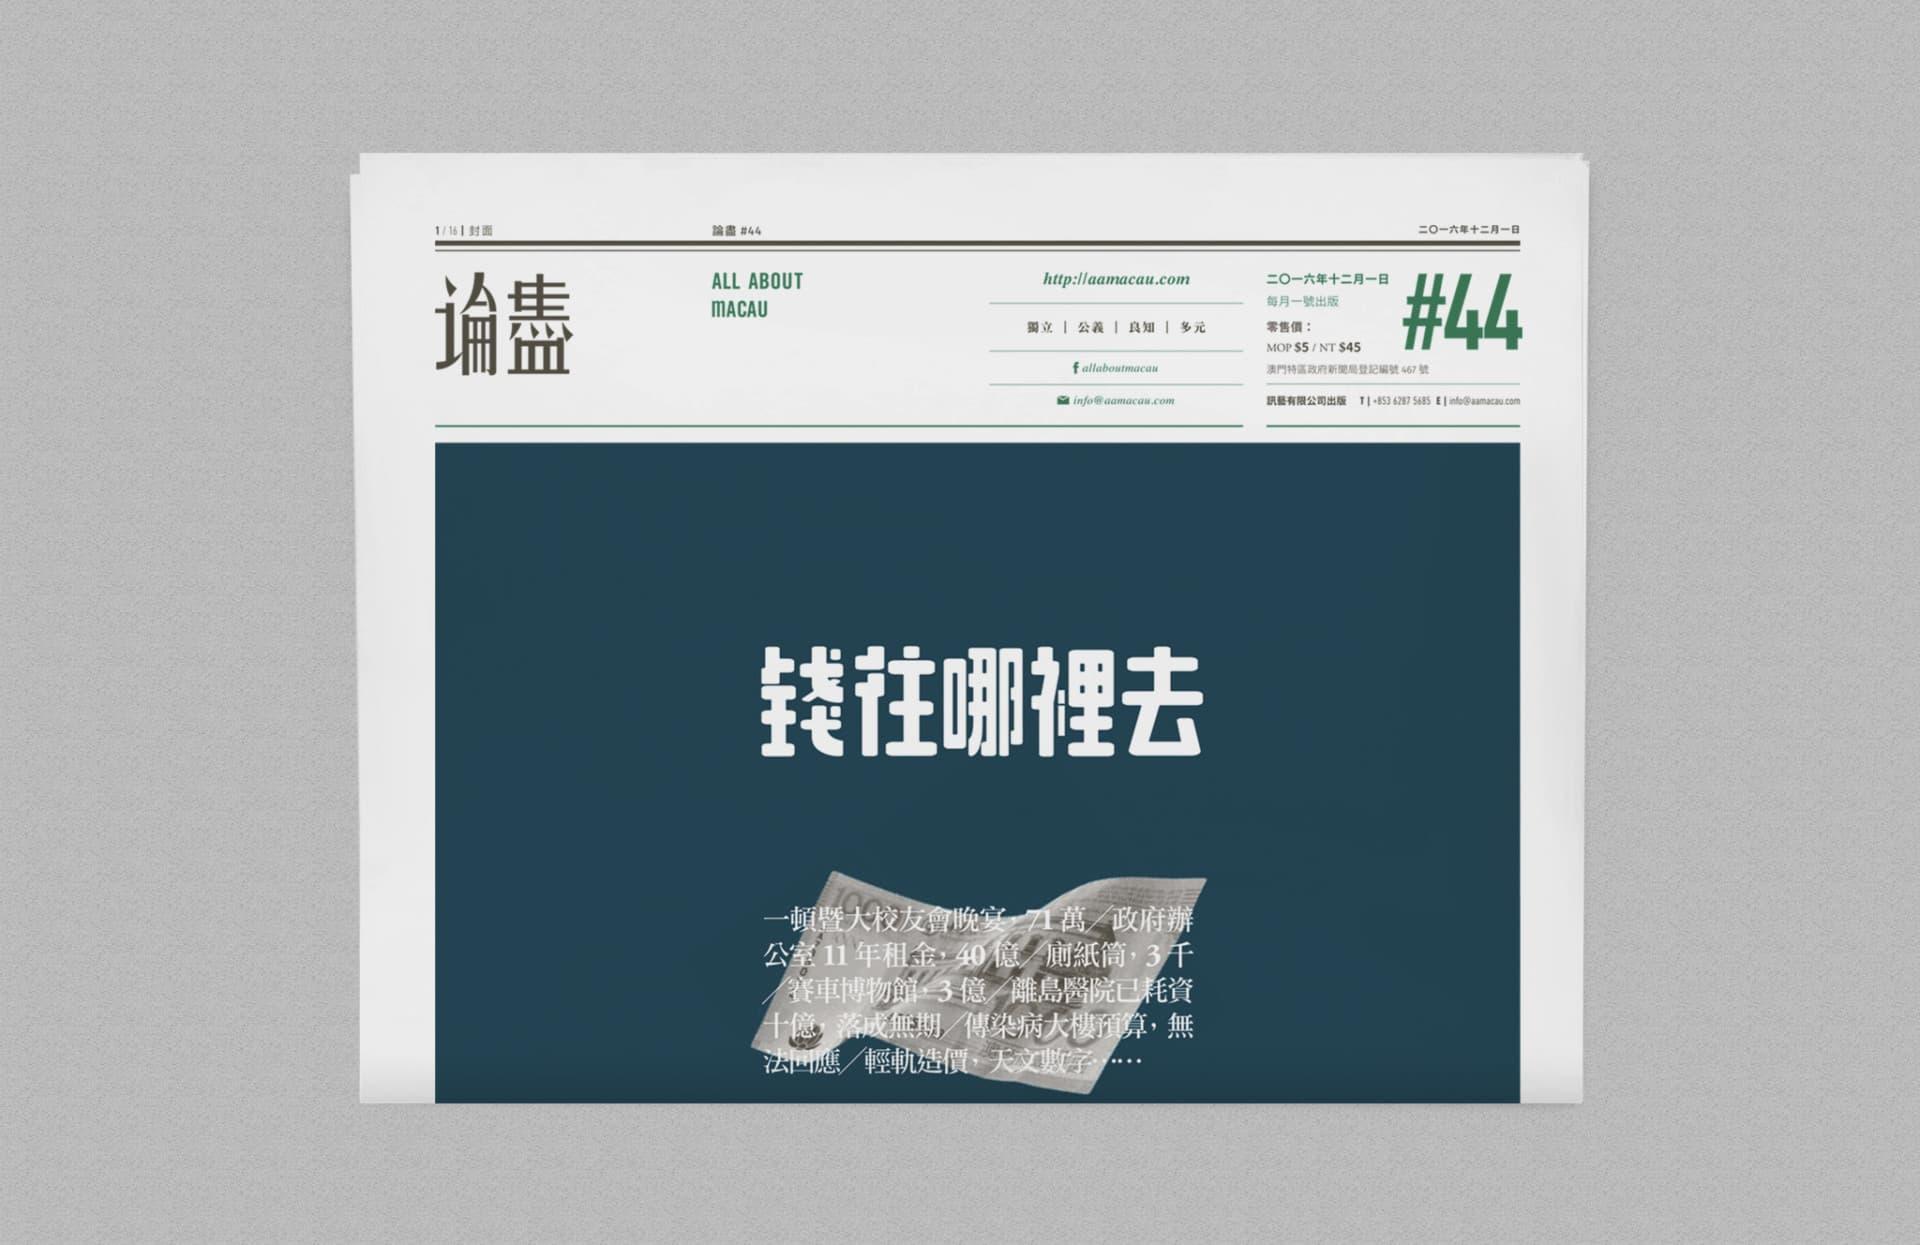 044-web-banner